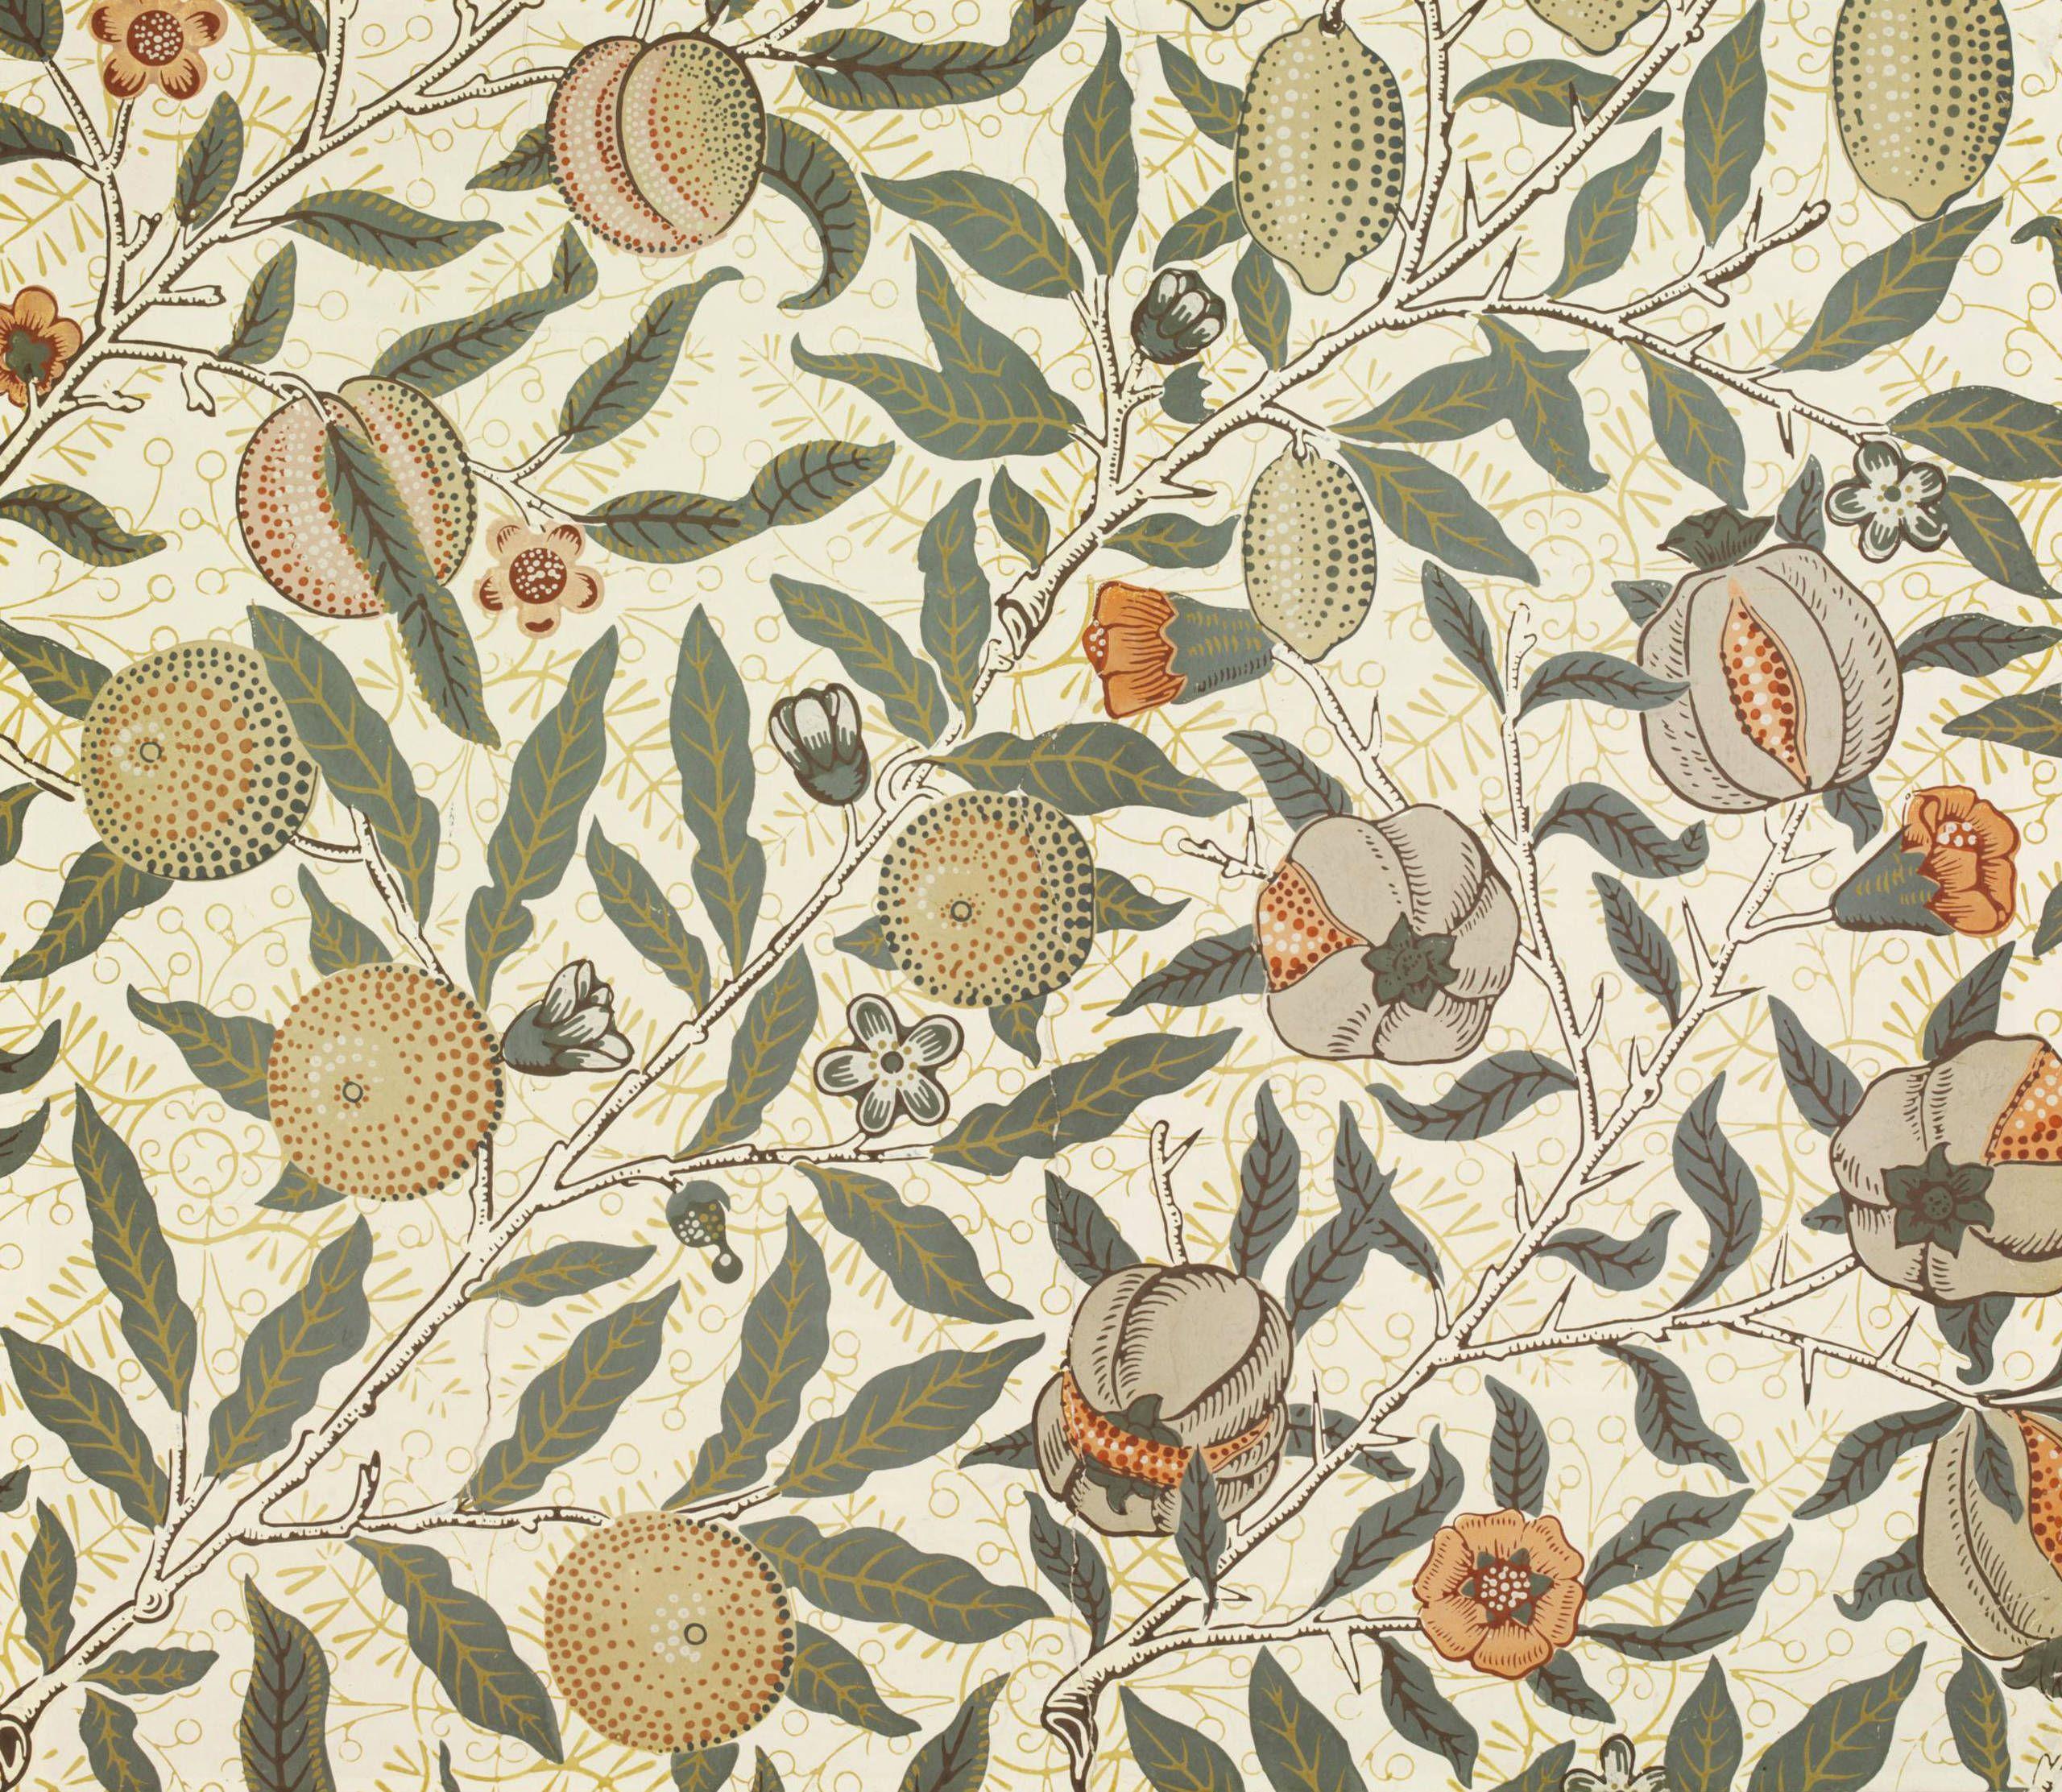 8.fruit.2008bt7198 2500   William morris wallpaper, Morris ...